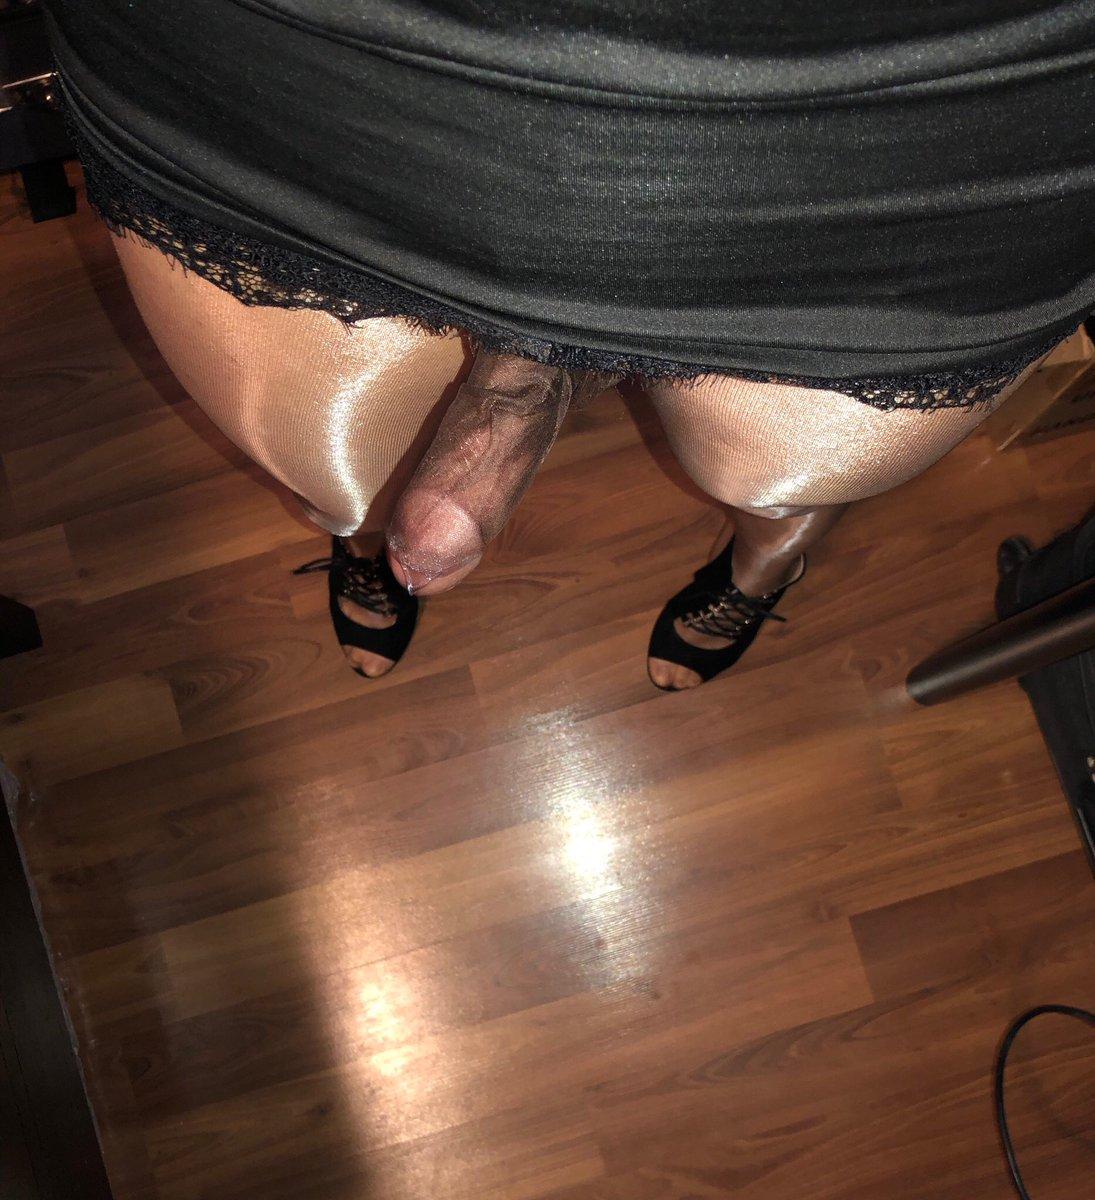 eba3538eb77  crossdresser  nylon  Cervin  Eterno15  glossypantyhose  stockings   nylonfeet  nyloncockpic.twitter.com 2zqBlCaGl4